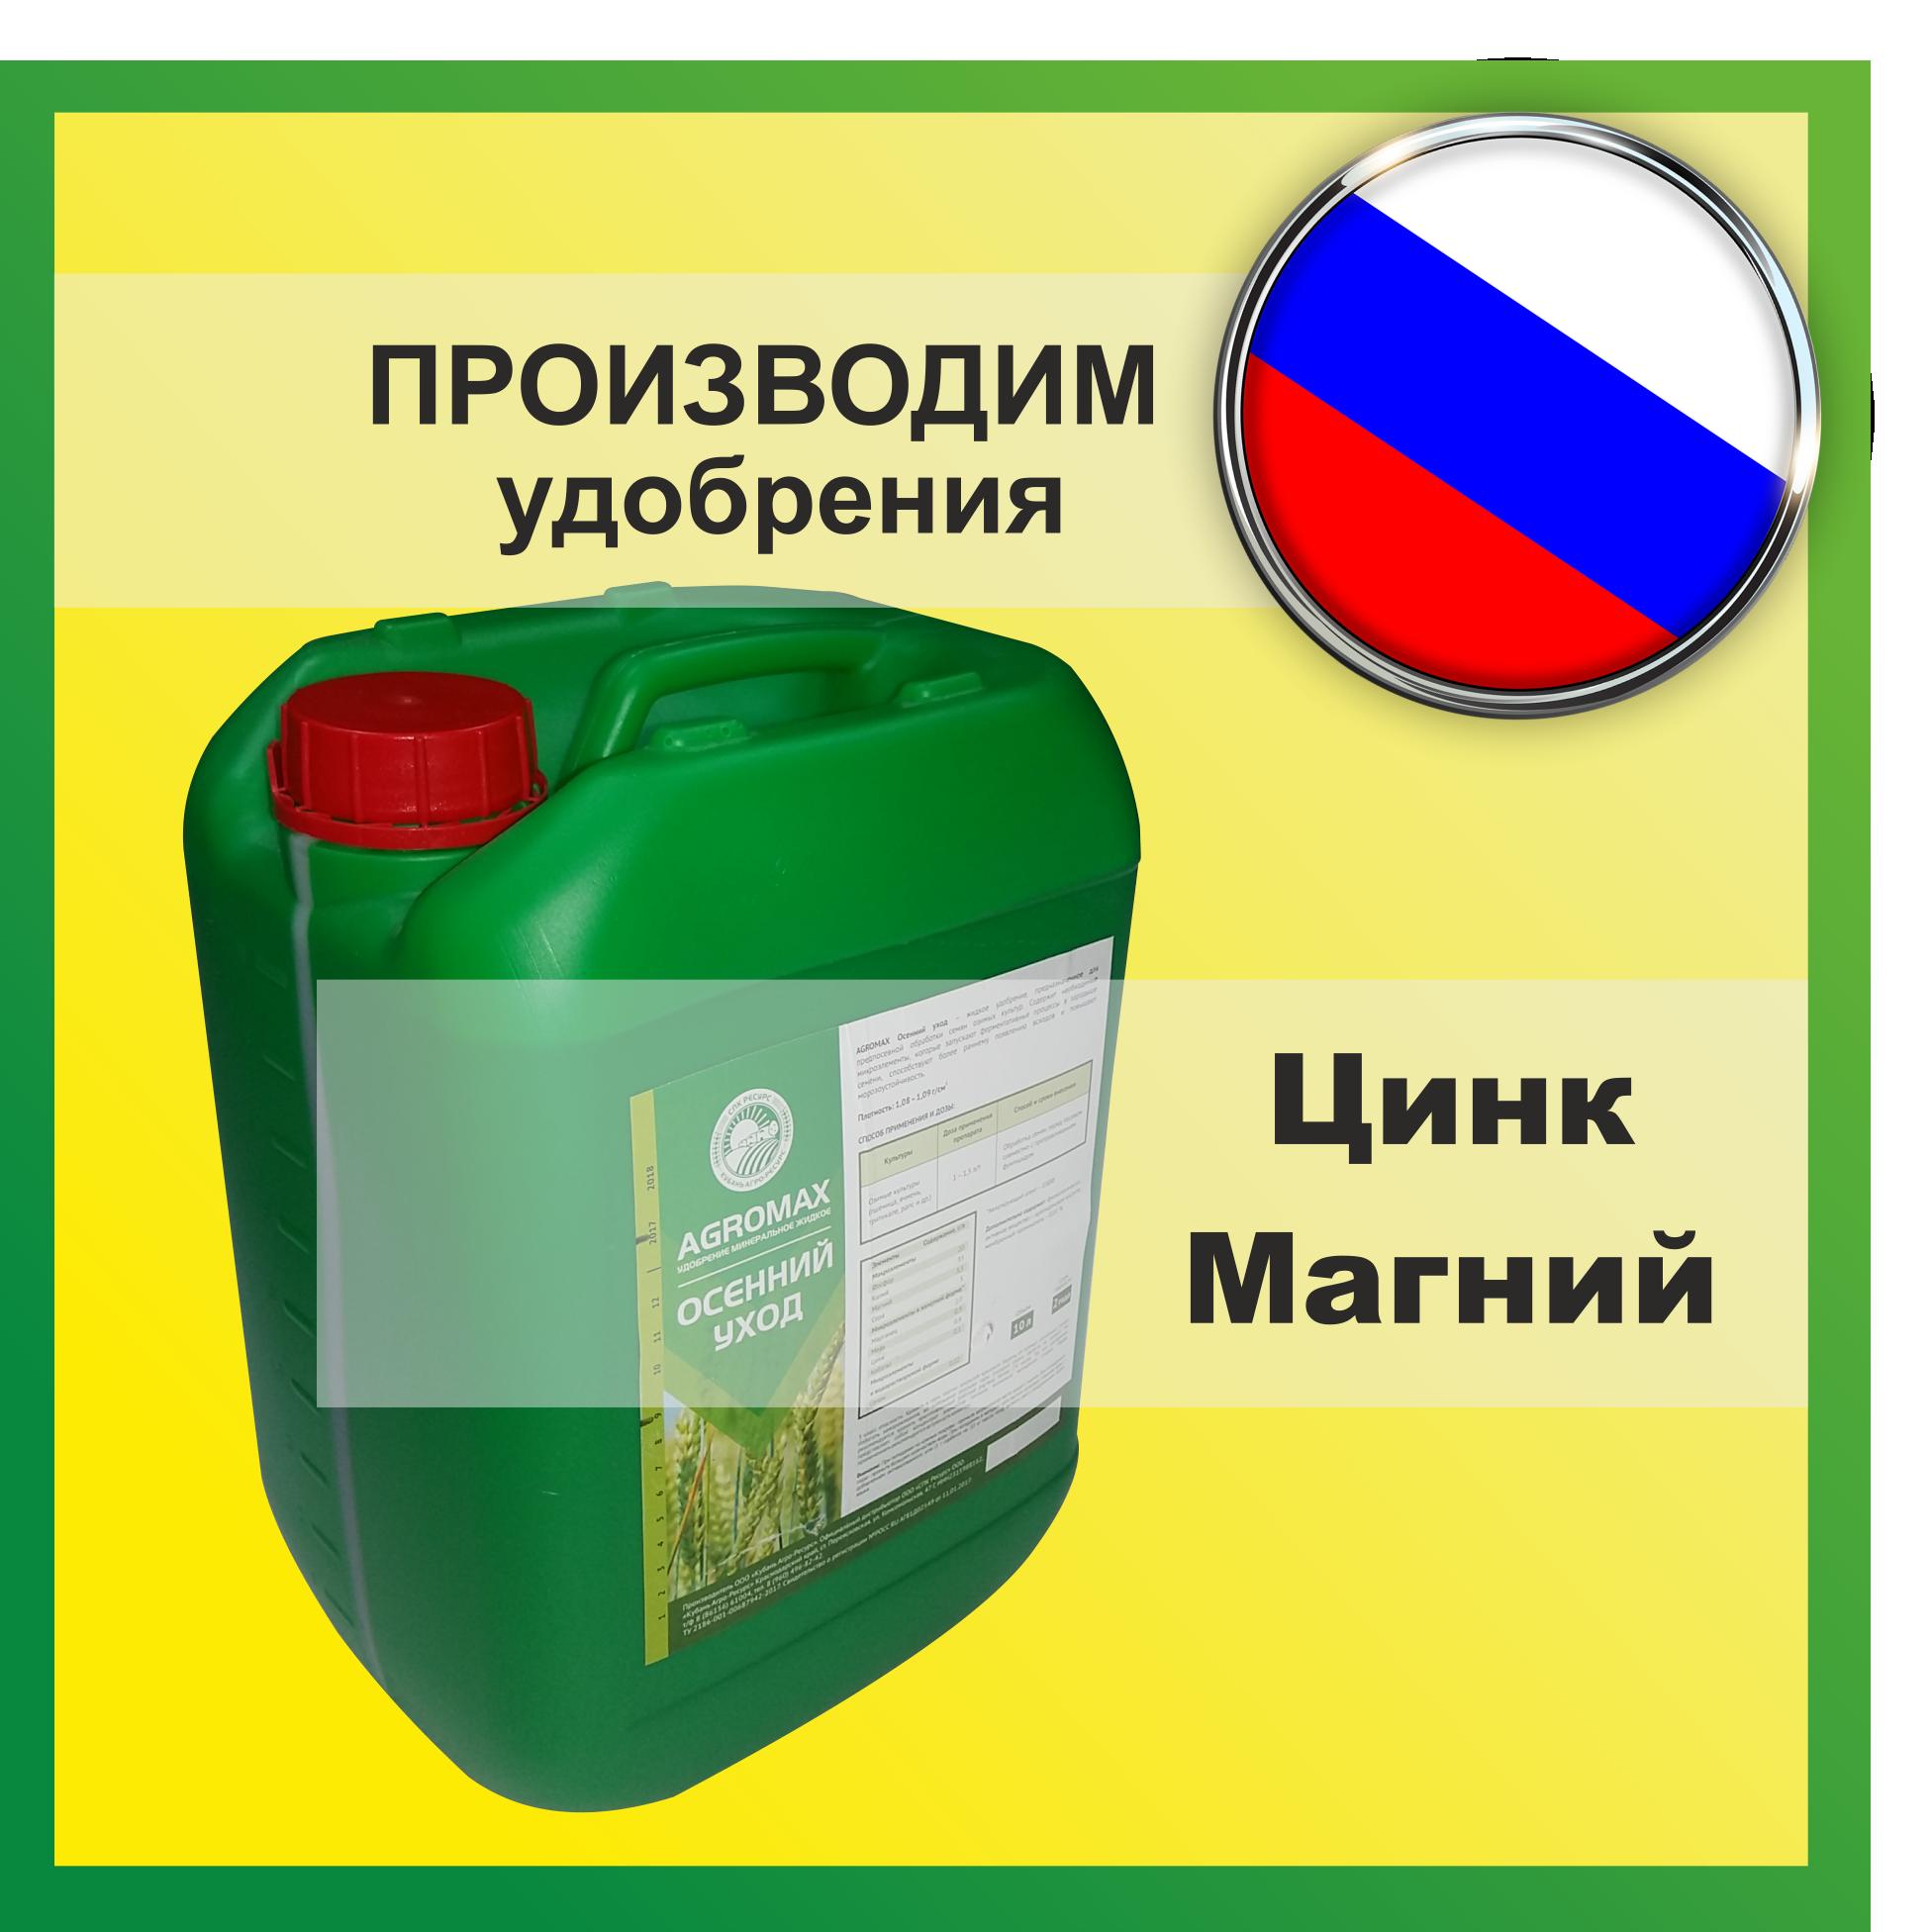 TSink-Magnij-udobrenie-agromaks-1-1